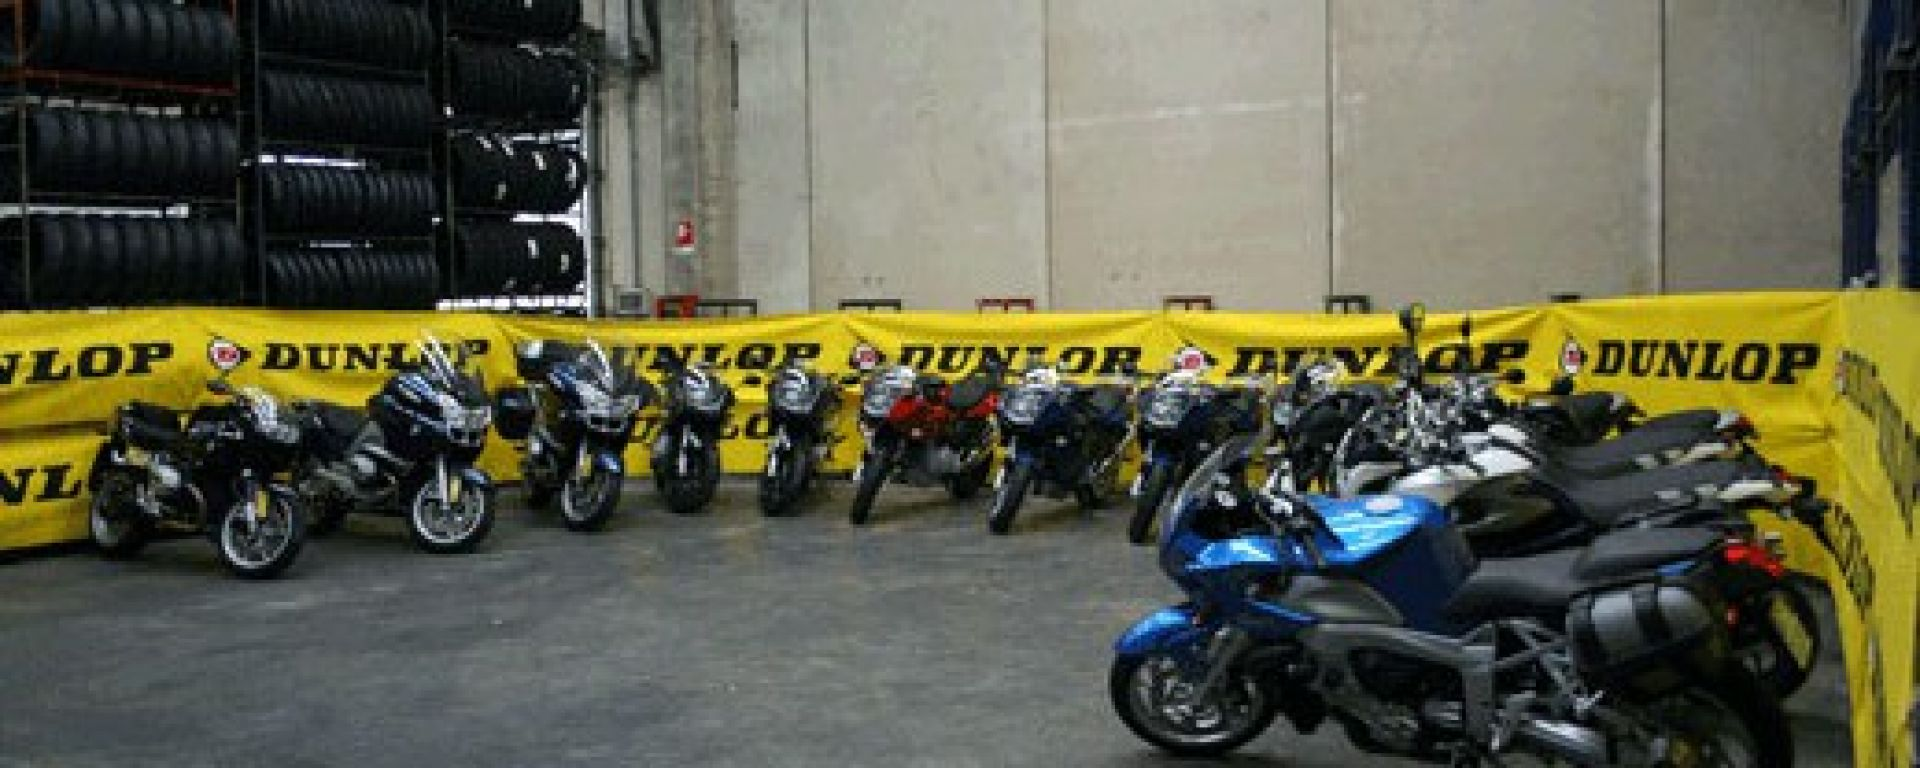 Dunlop RoadSmart